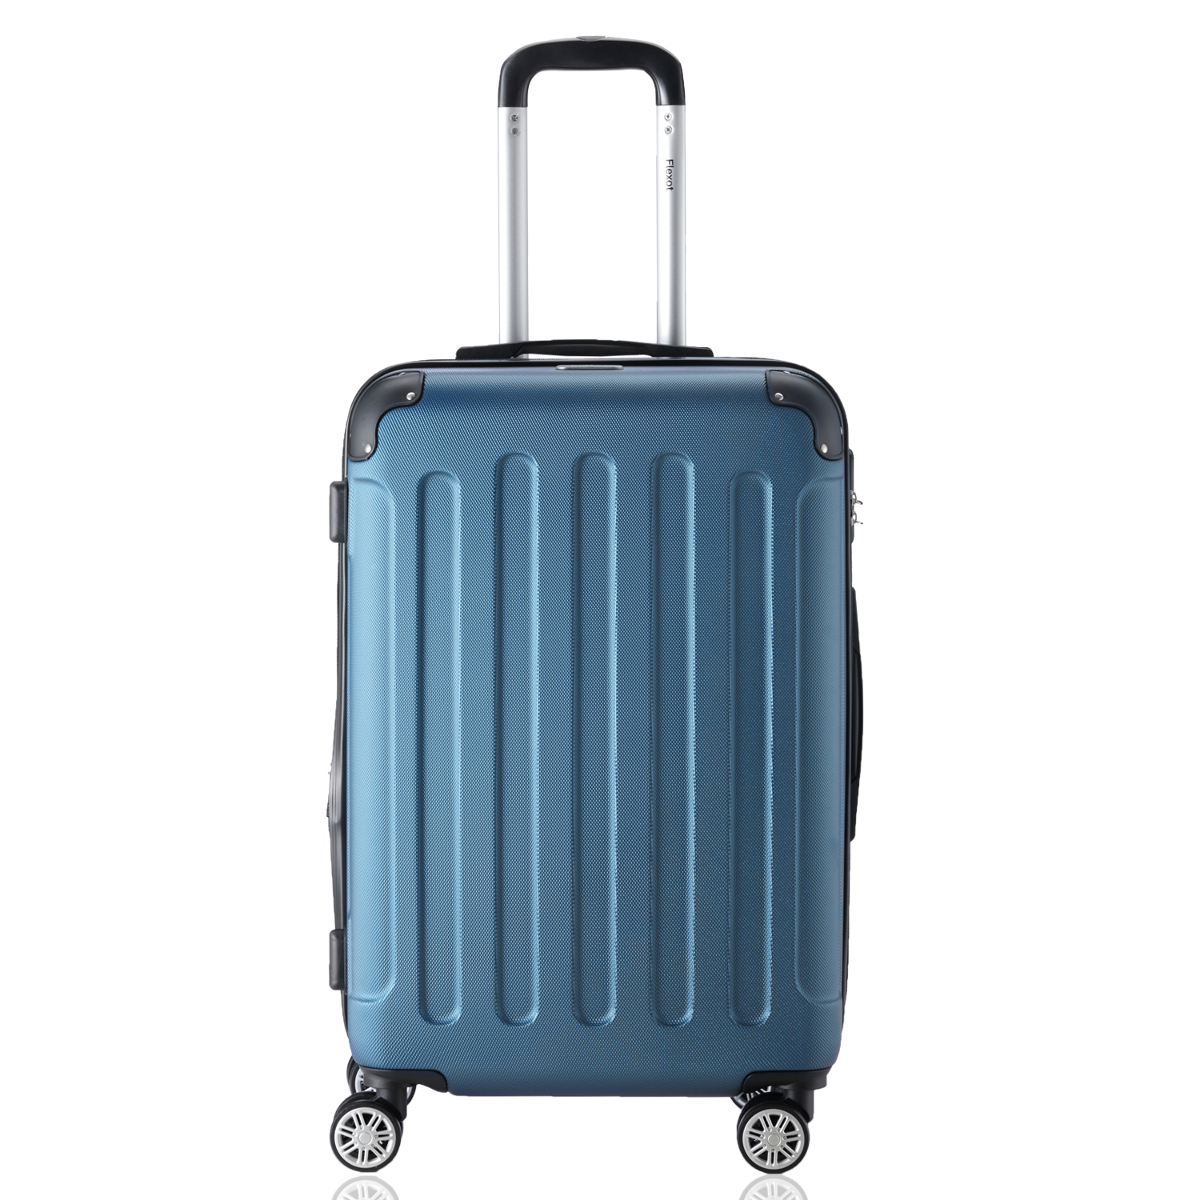 Koffer-Flexot-2045-Hartschalenkoffer-Trolley-Kofferset-Reisekoffer-M-L-XL-Set Indexbild 12